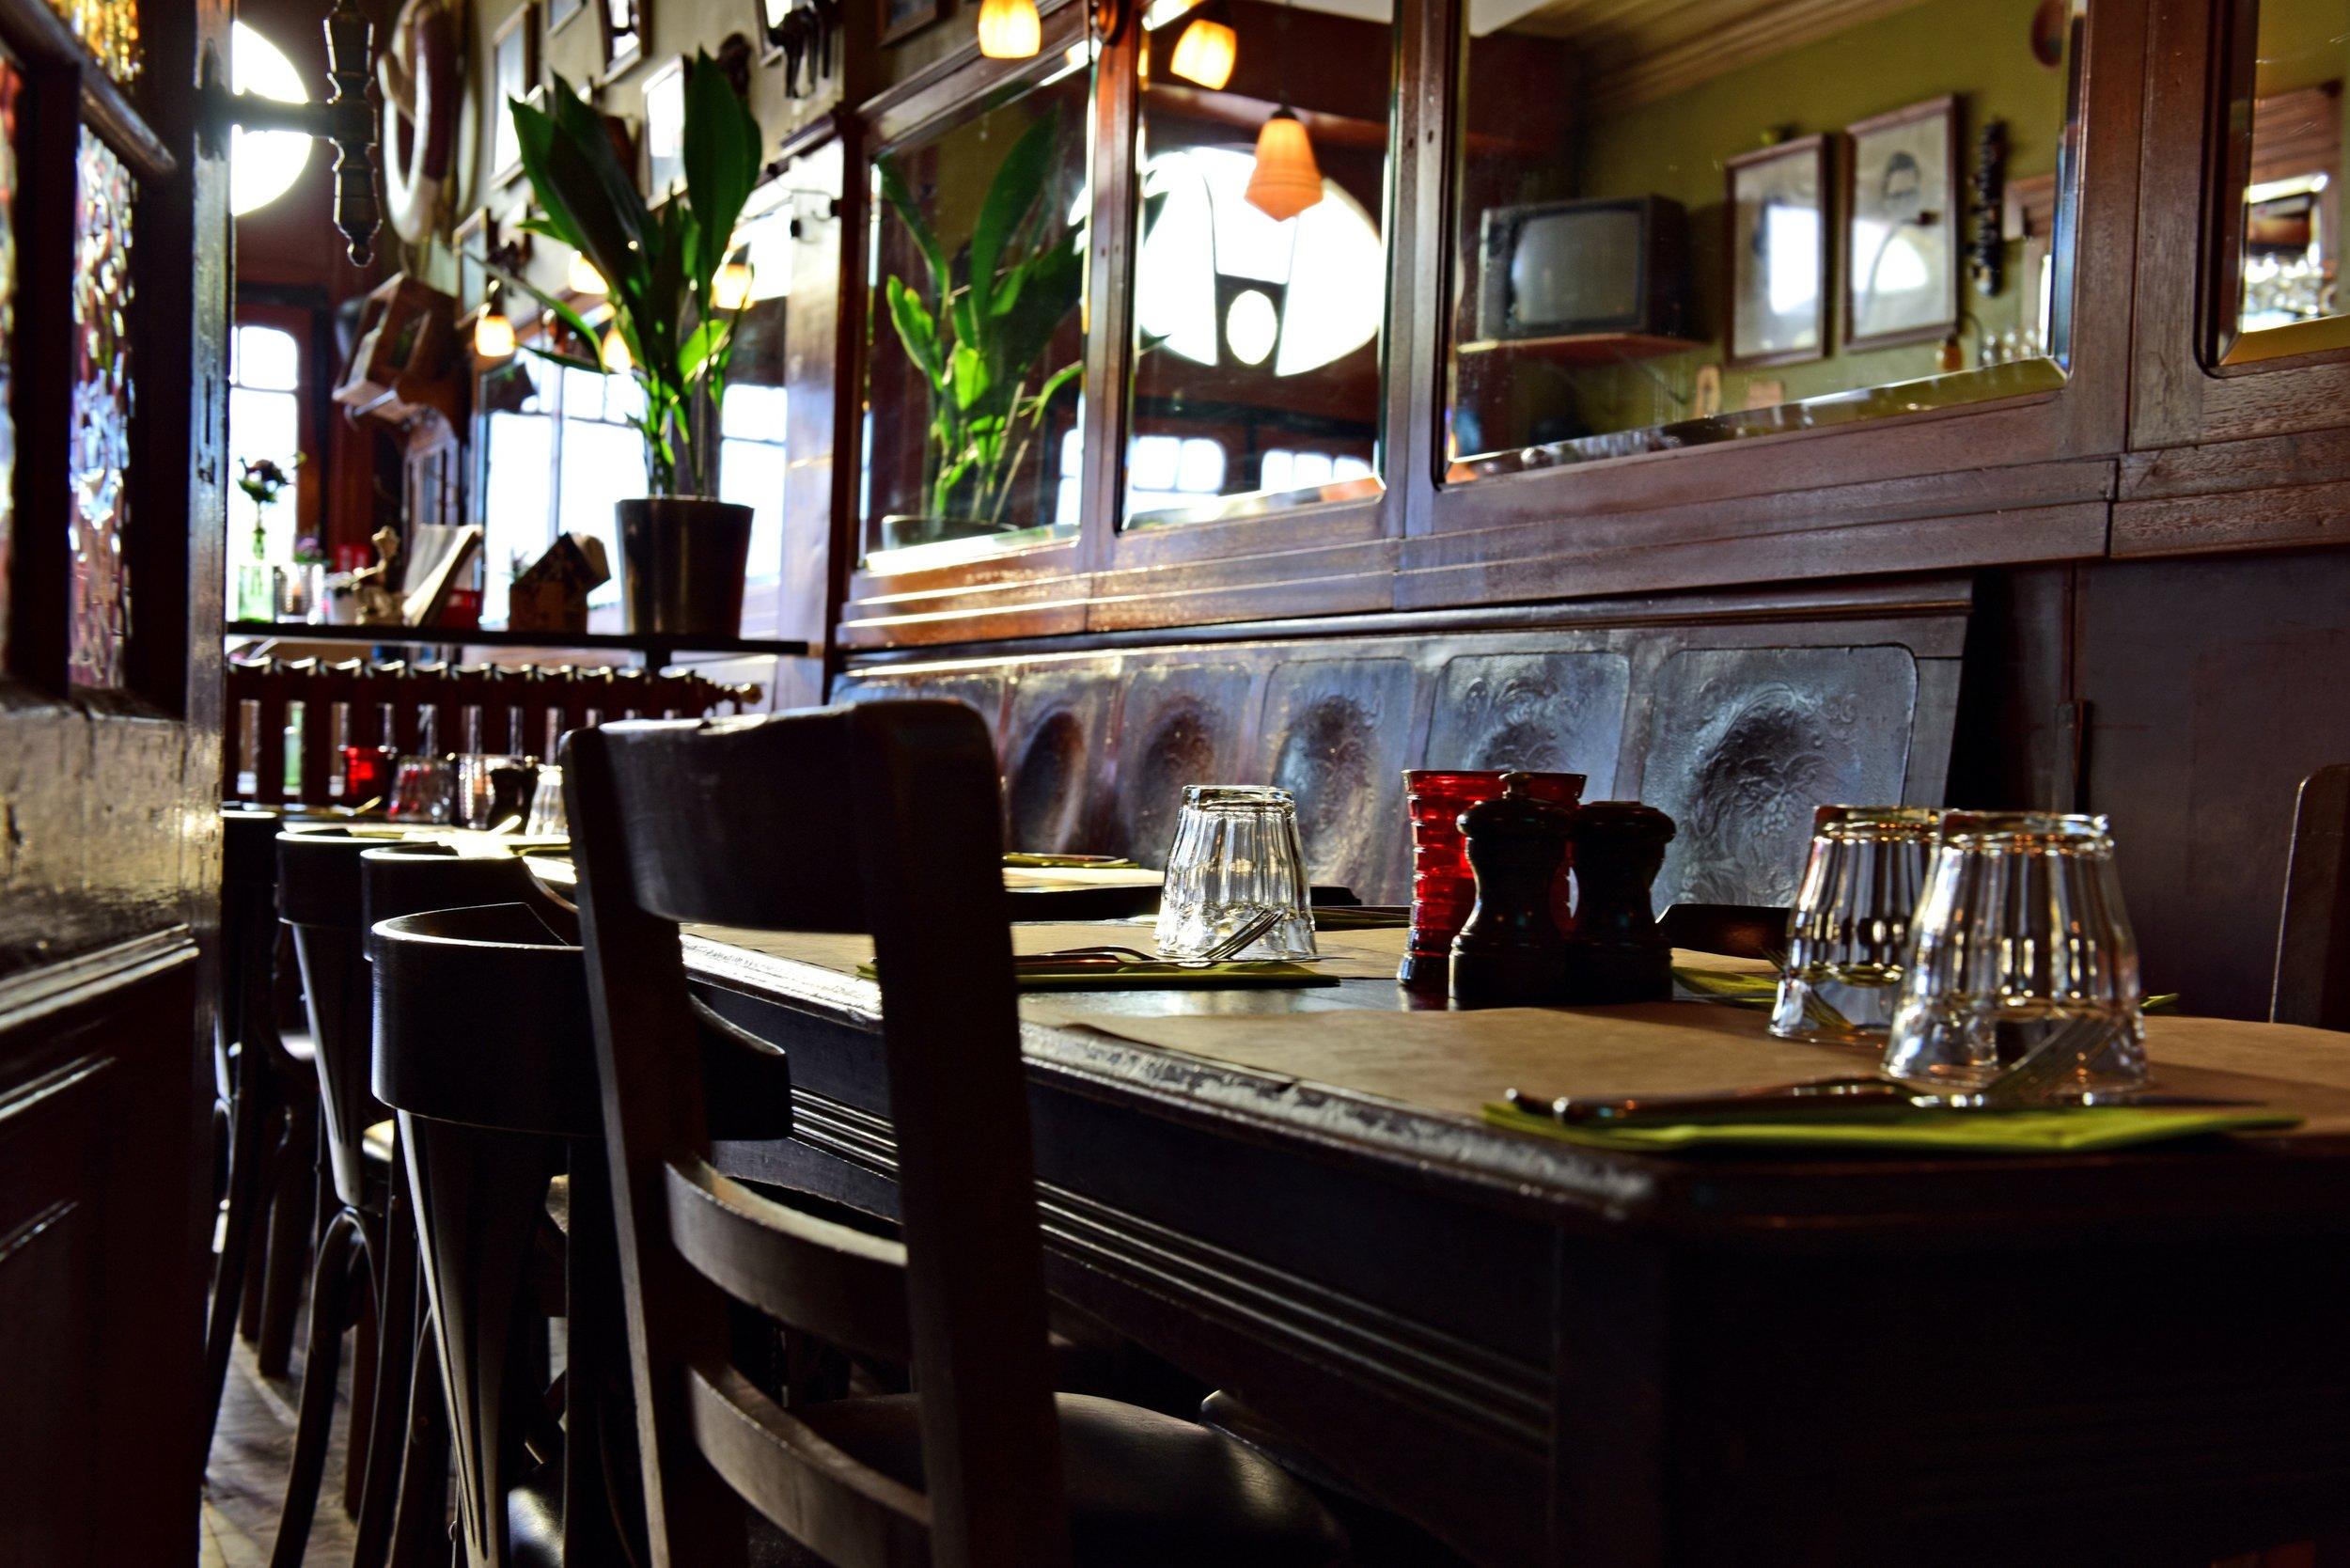 4 la pipe d anvers antwerpen brasserie antwerp best restaurant tablefever.jpg